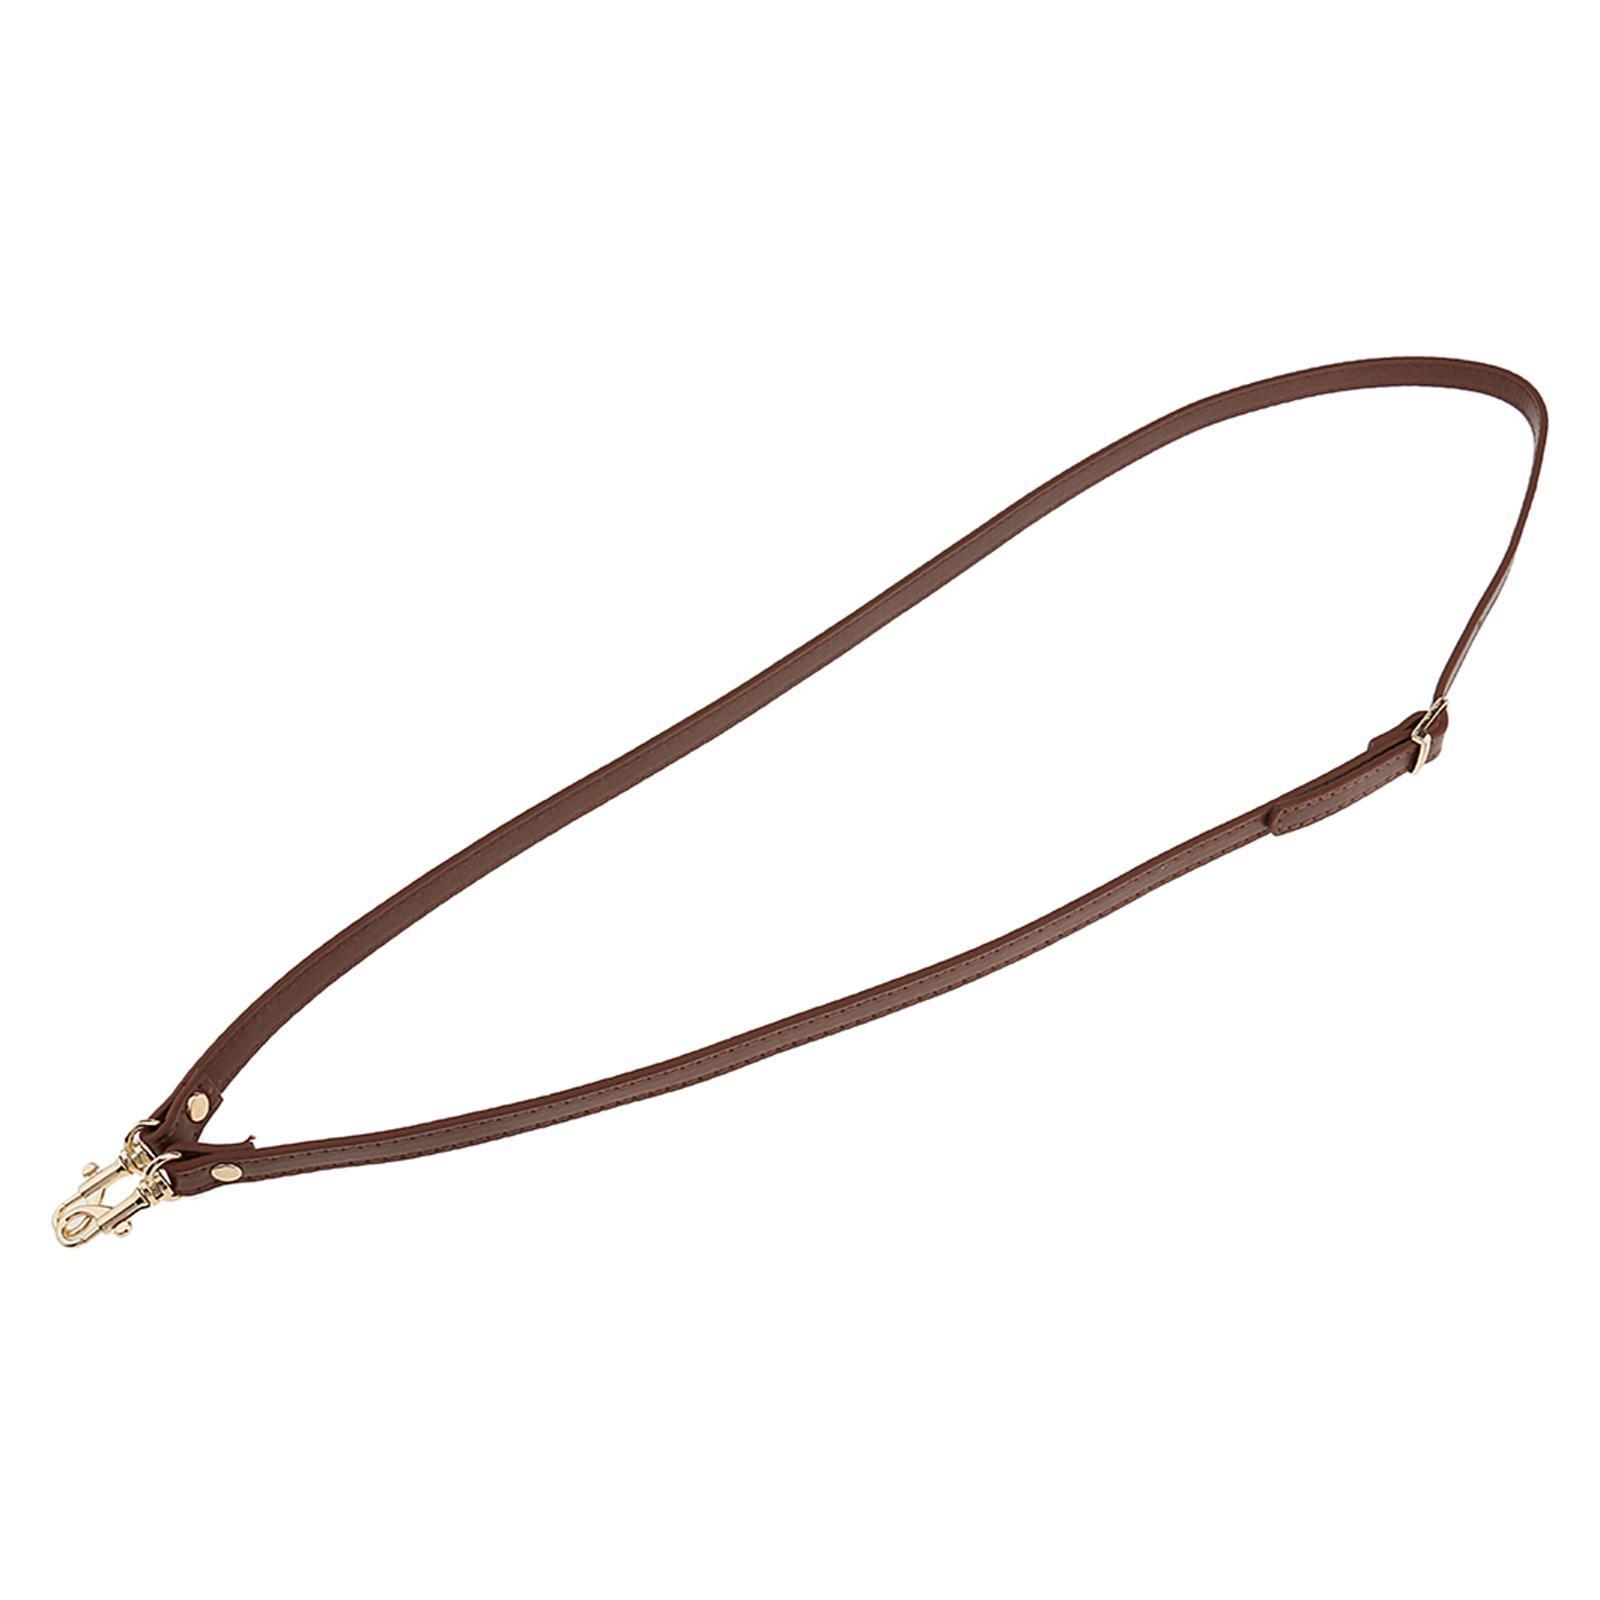 120cm-Bag-Leather-Strap-Replacement-Shoulder-Bags-Handle-Crossbody-Strap thumbnail 12